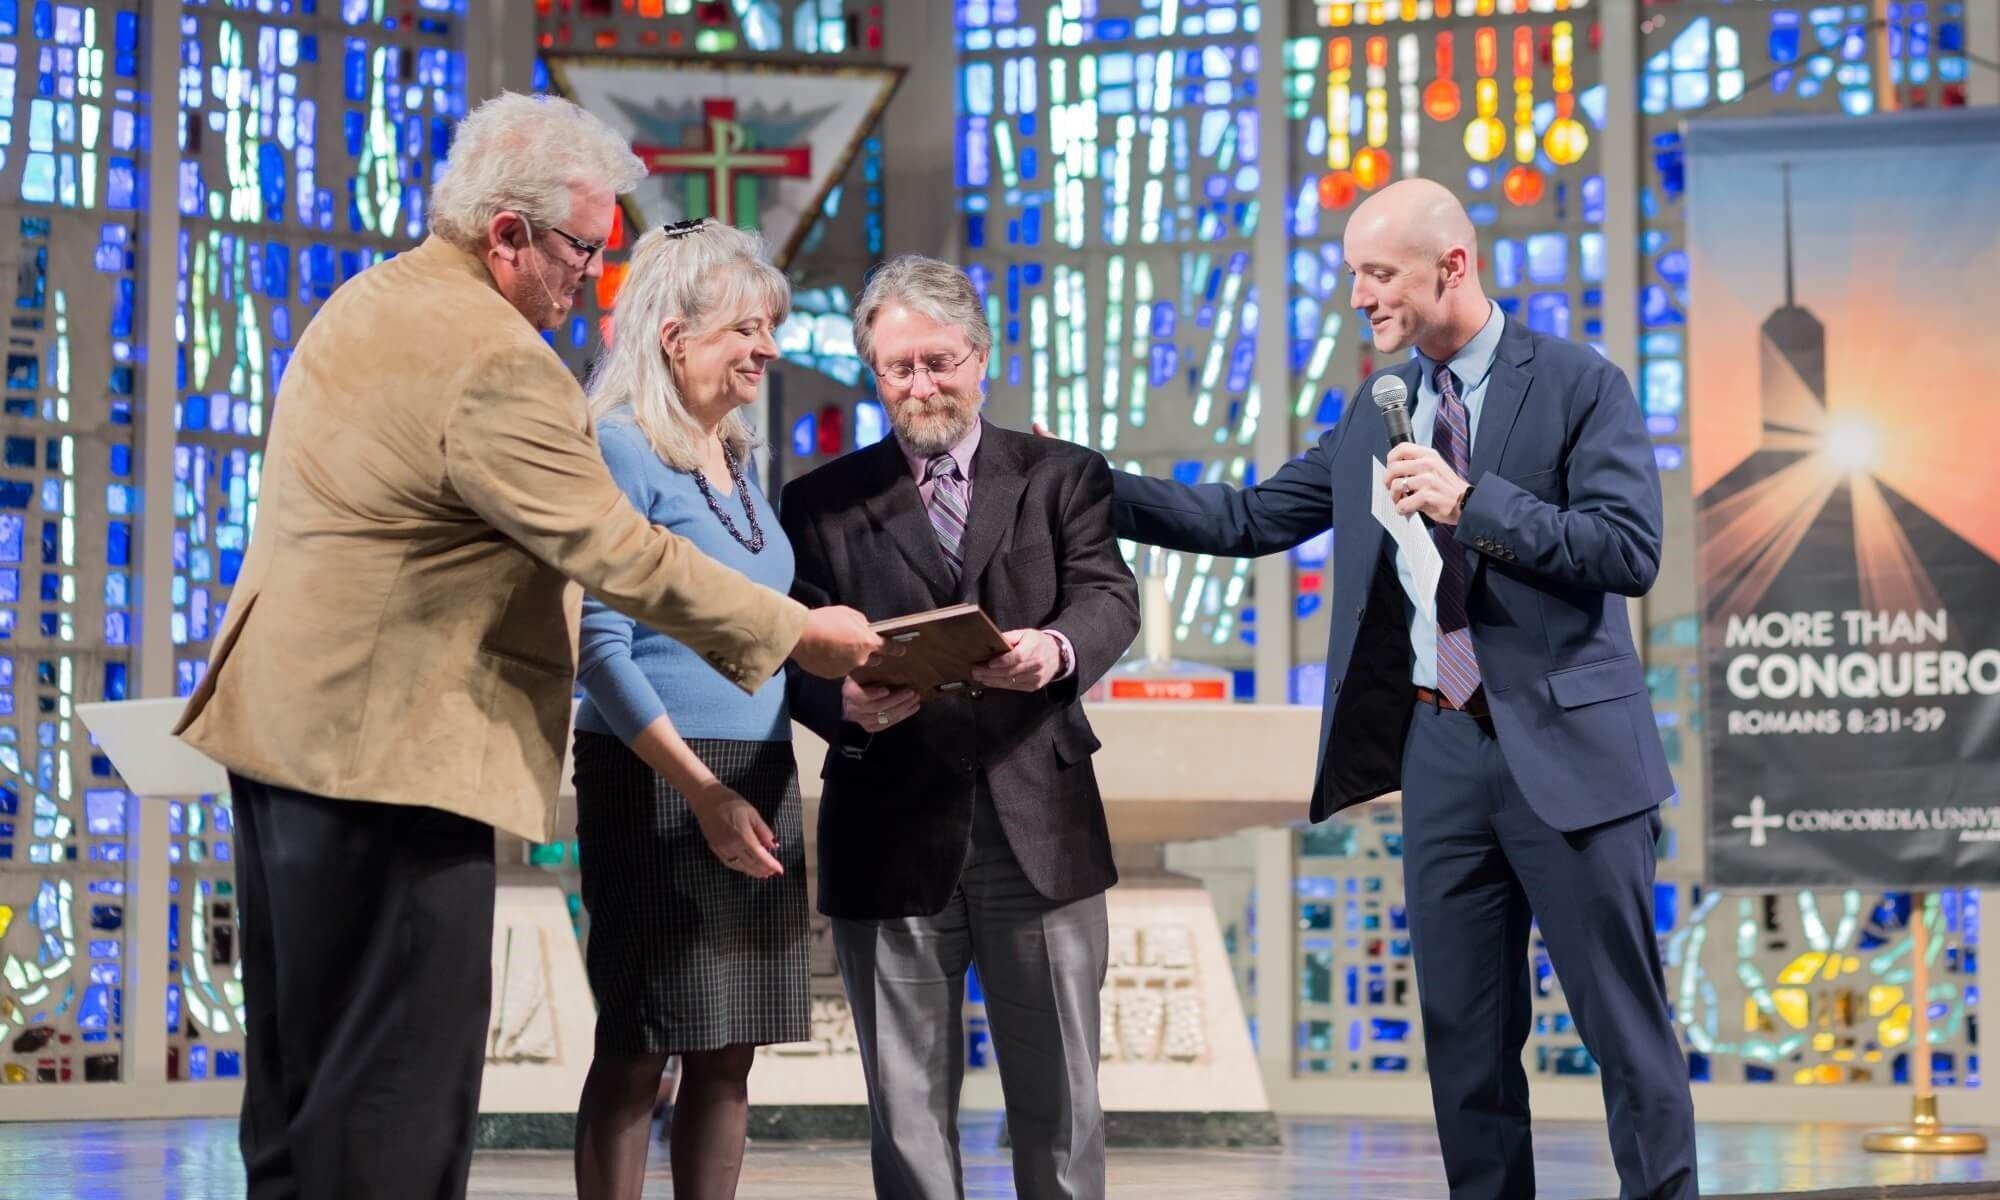 2019 Outstanding Alumnus Award